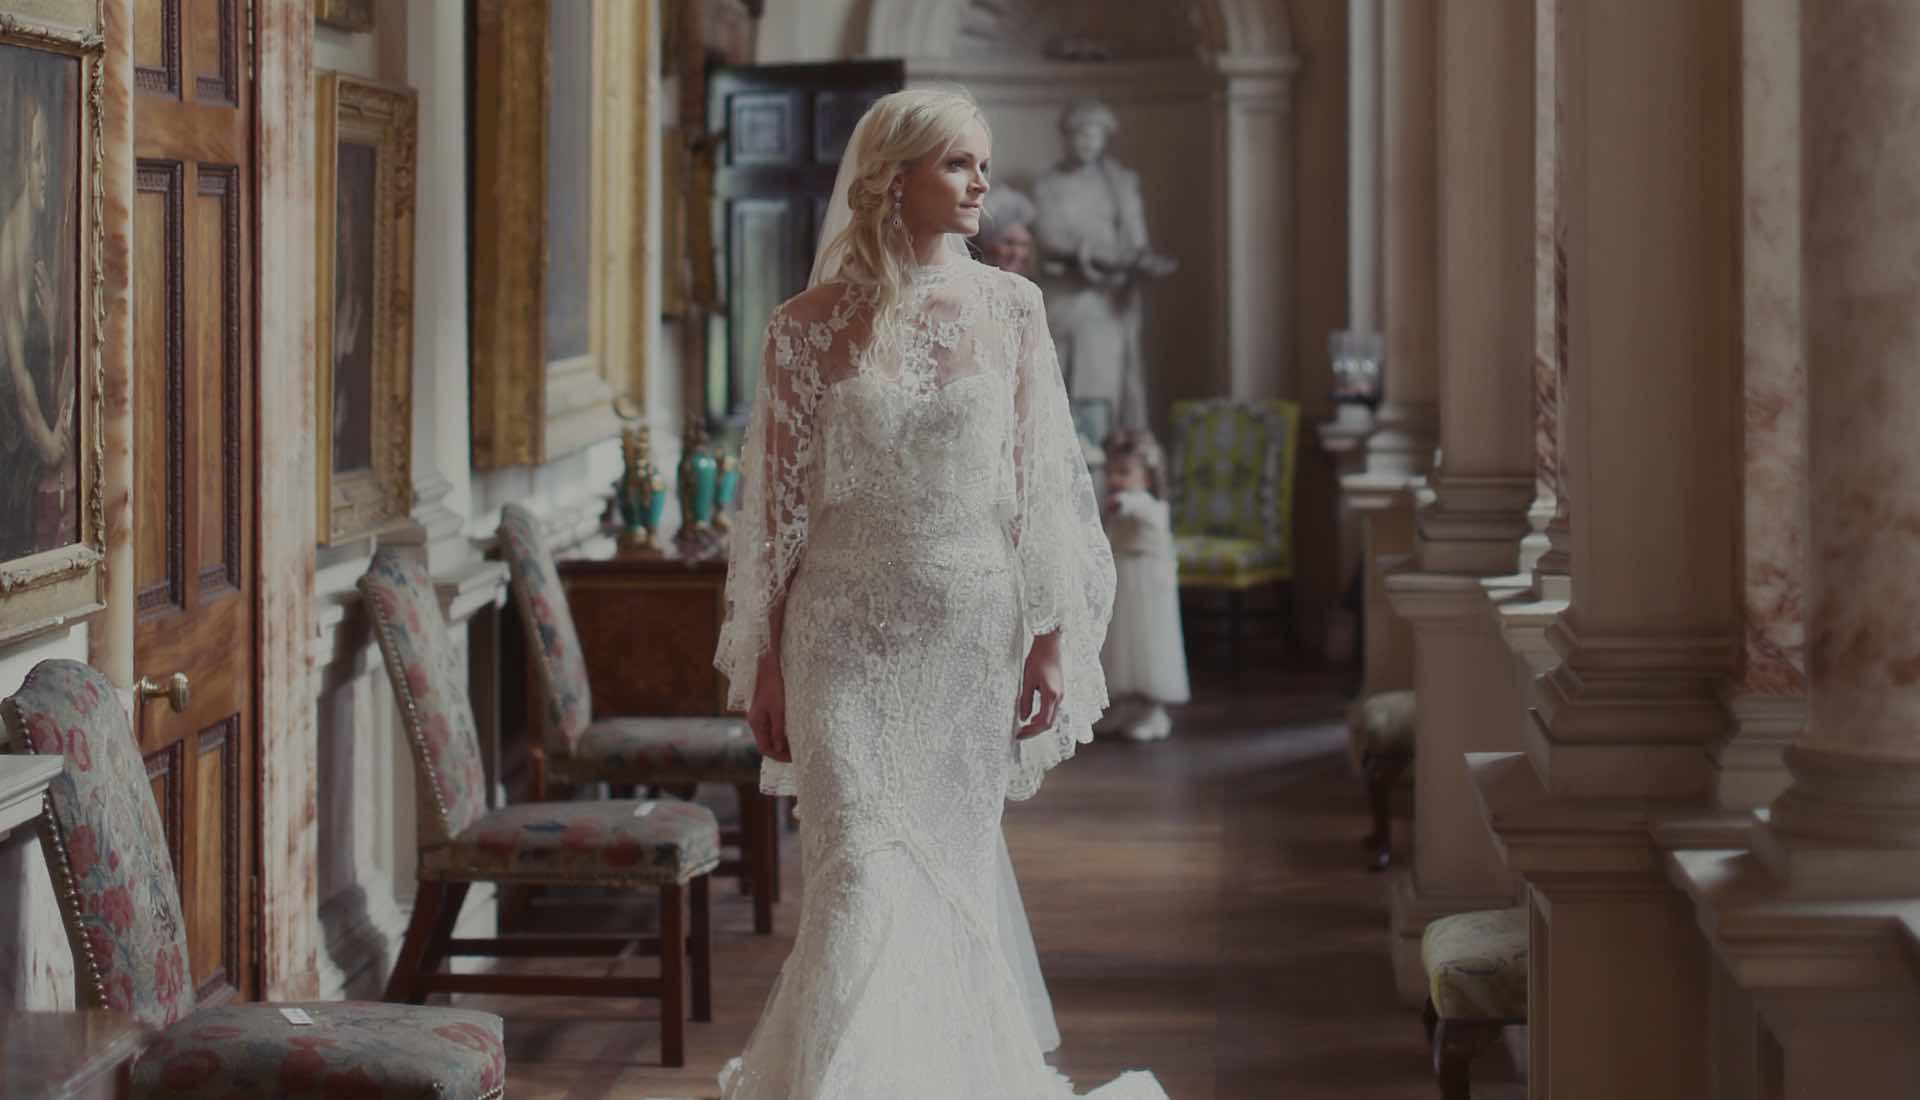 Home Gosford House – Slide 03 – Weddings